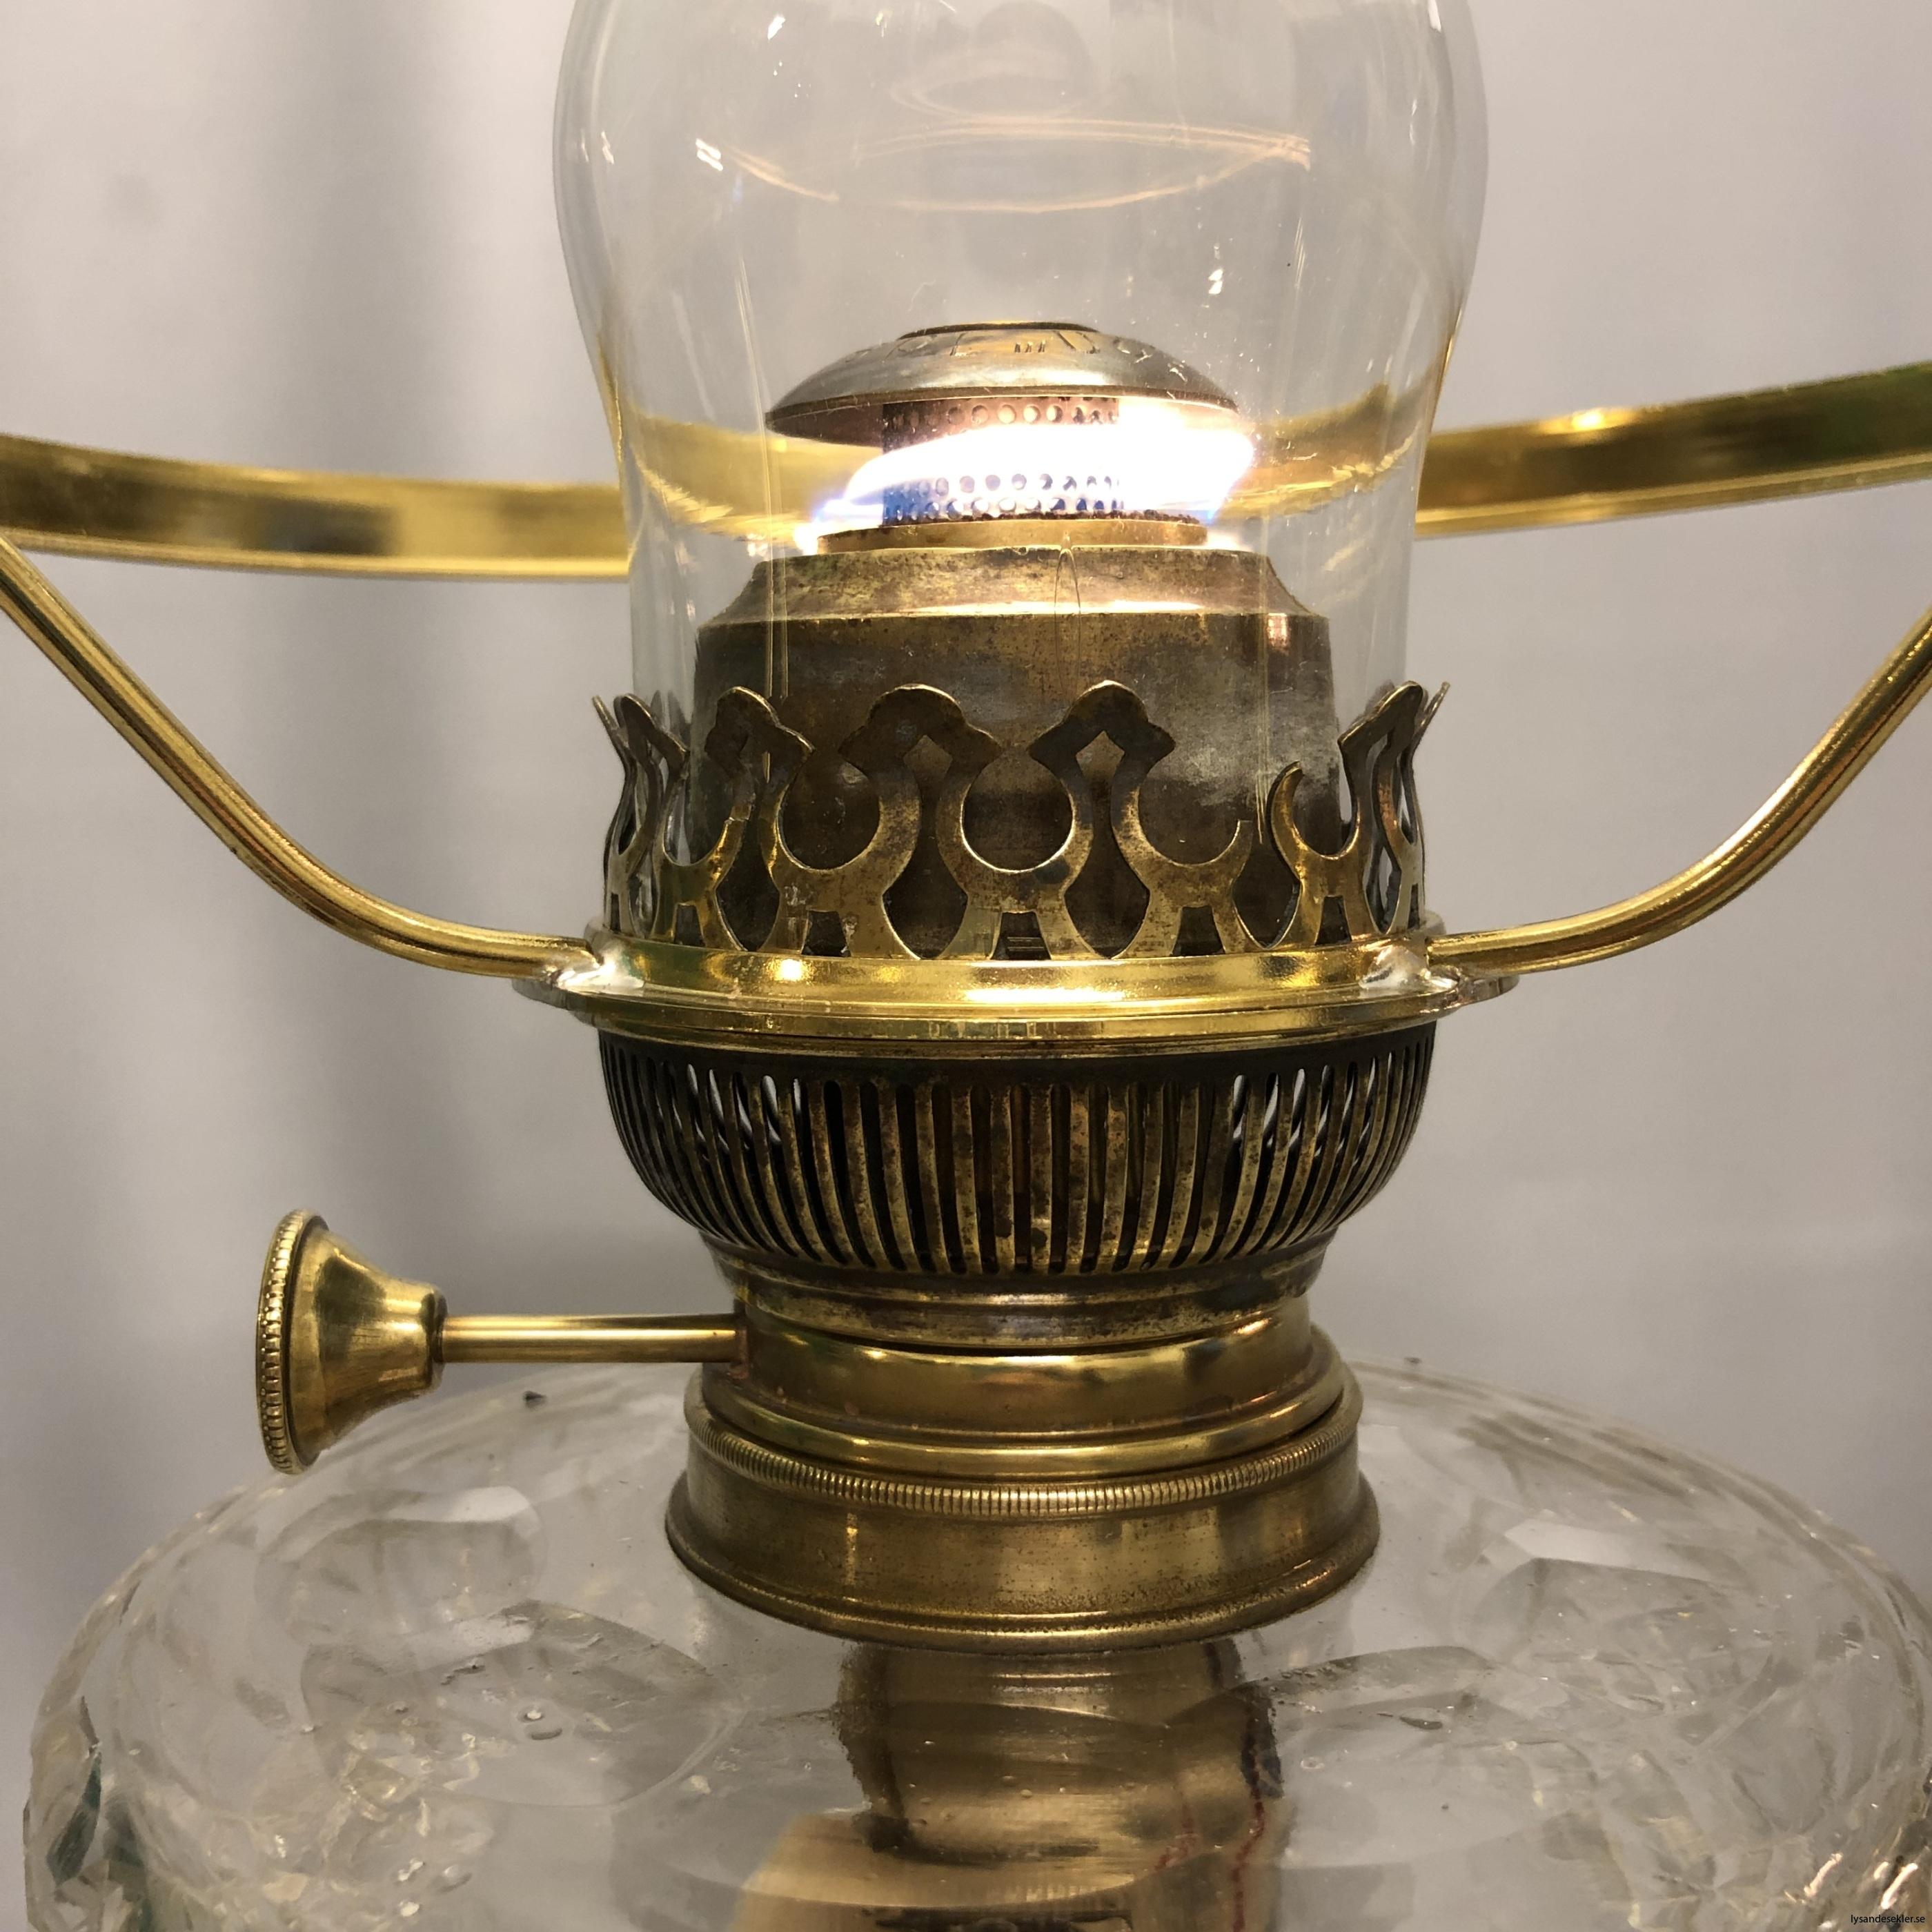 fotogenlampa fotogenlampor oljelampa lysande sekler lampverkstad35